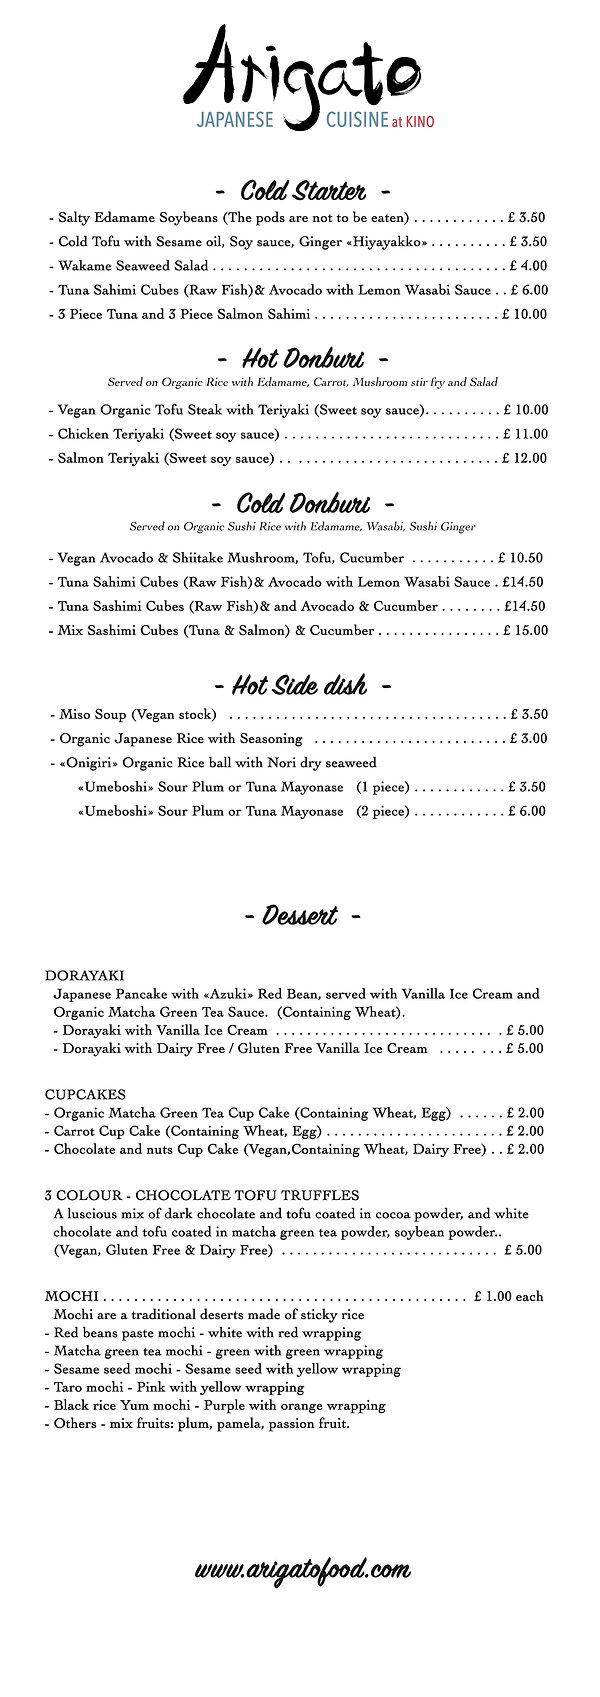 arigato-menu4-donburi.jpg